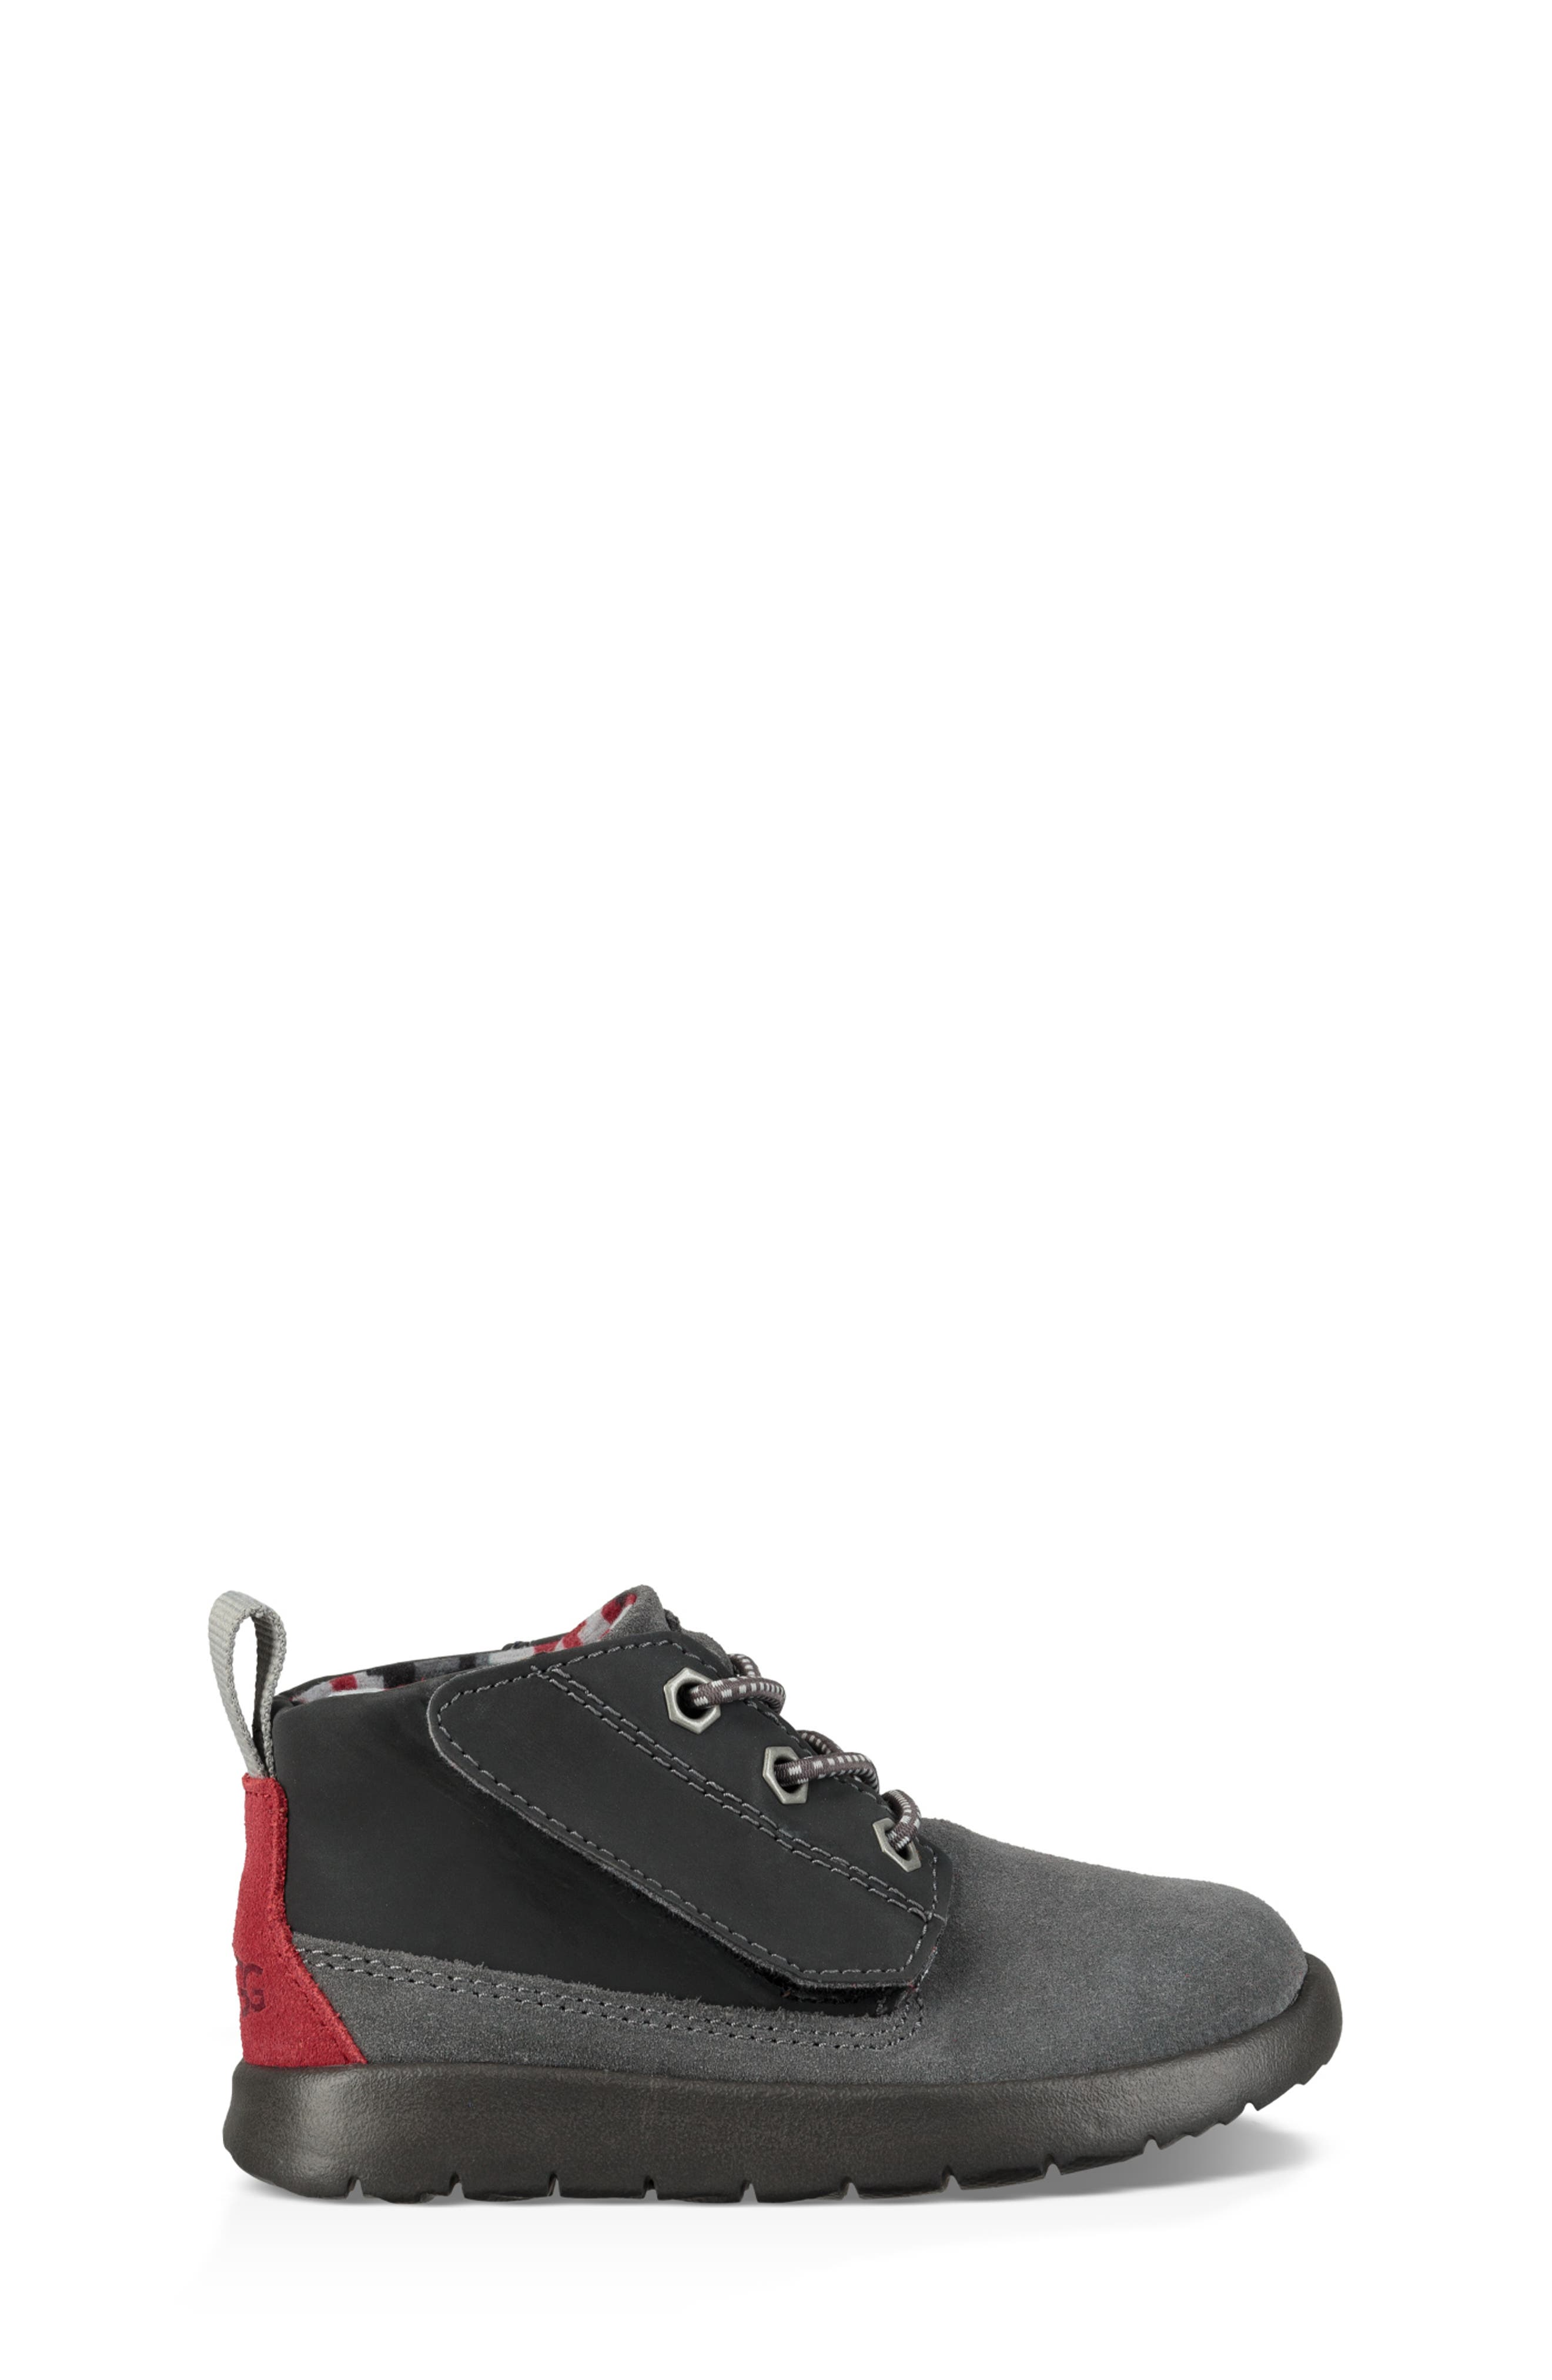 Canoe Chukka Sneaker,                             Alternate thumbnail 3, color,                             GREY / BLACK